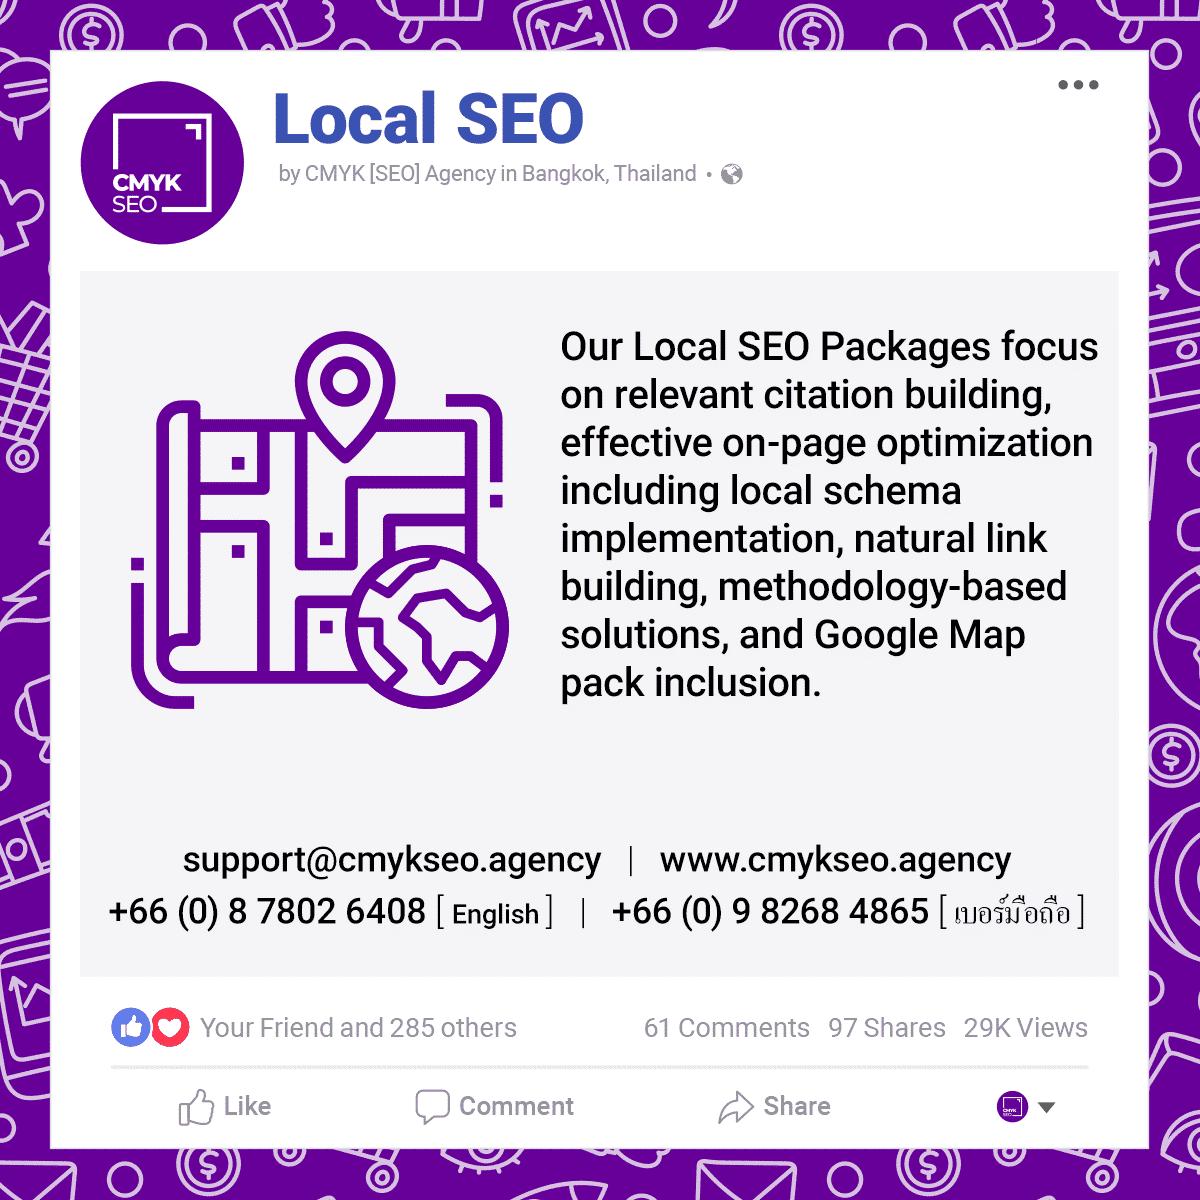 Local SEO Services by CMYK SEO Agency in Bangkok Thailand | CMYK [SEO/SEM] Agency